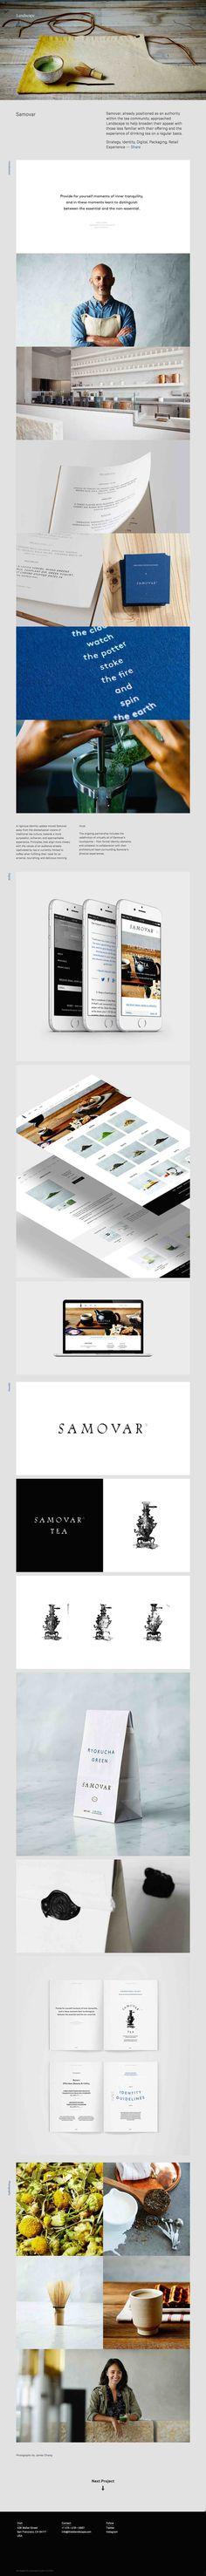 http://thisislandscape.com/projects/samovar/